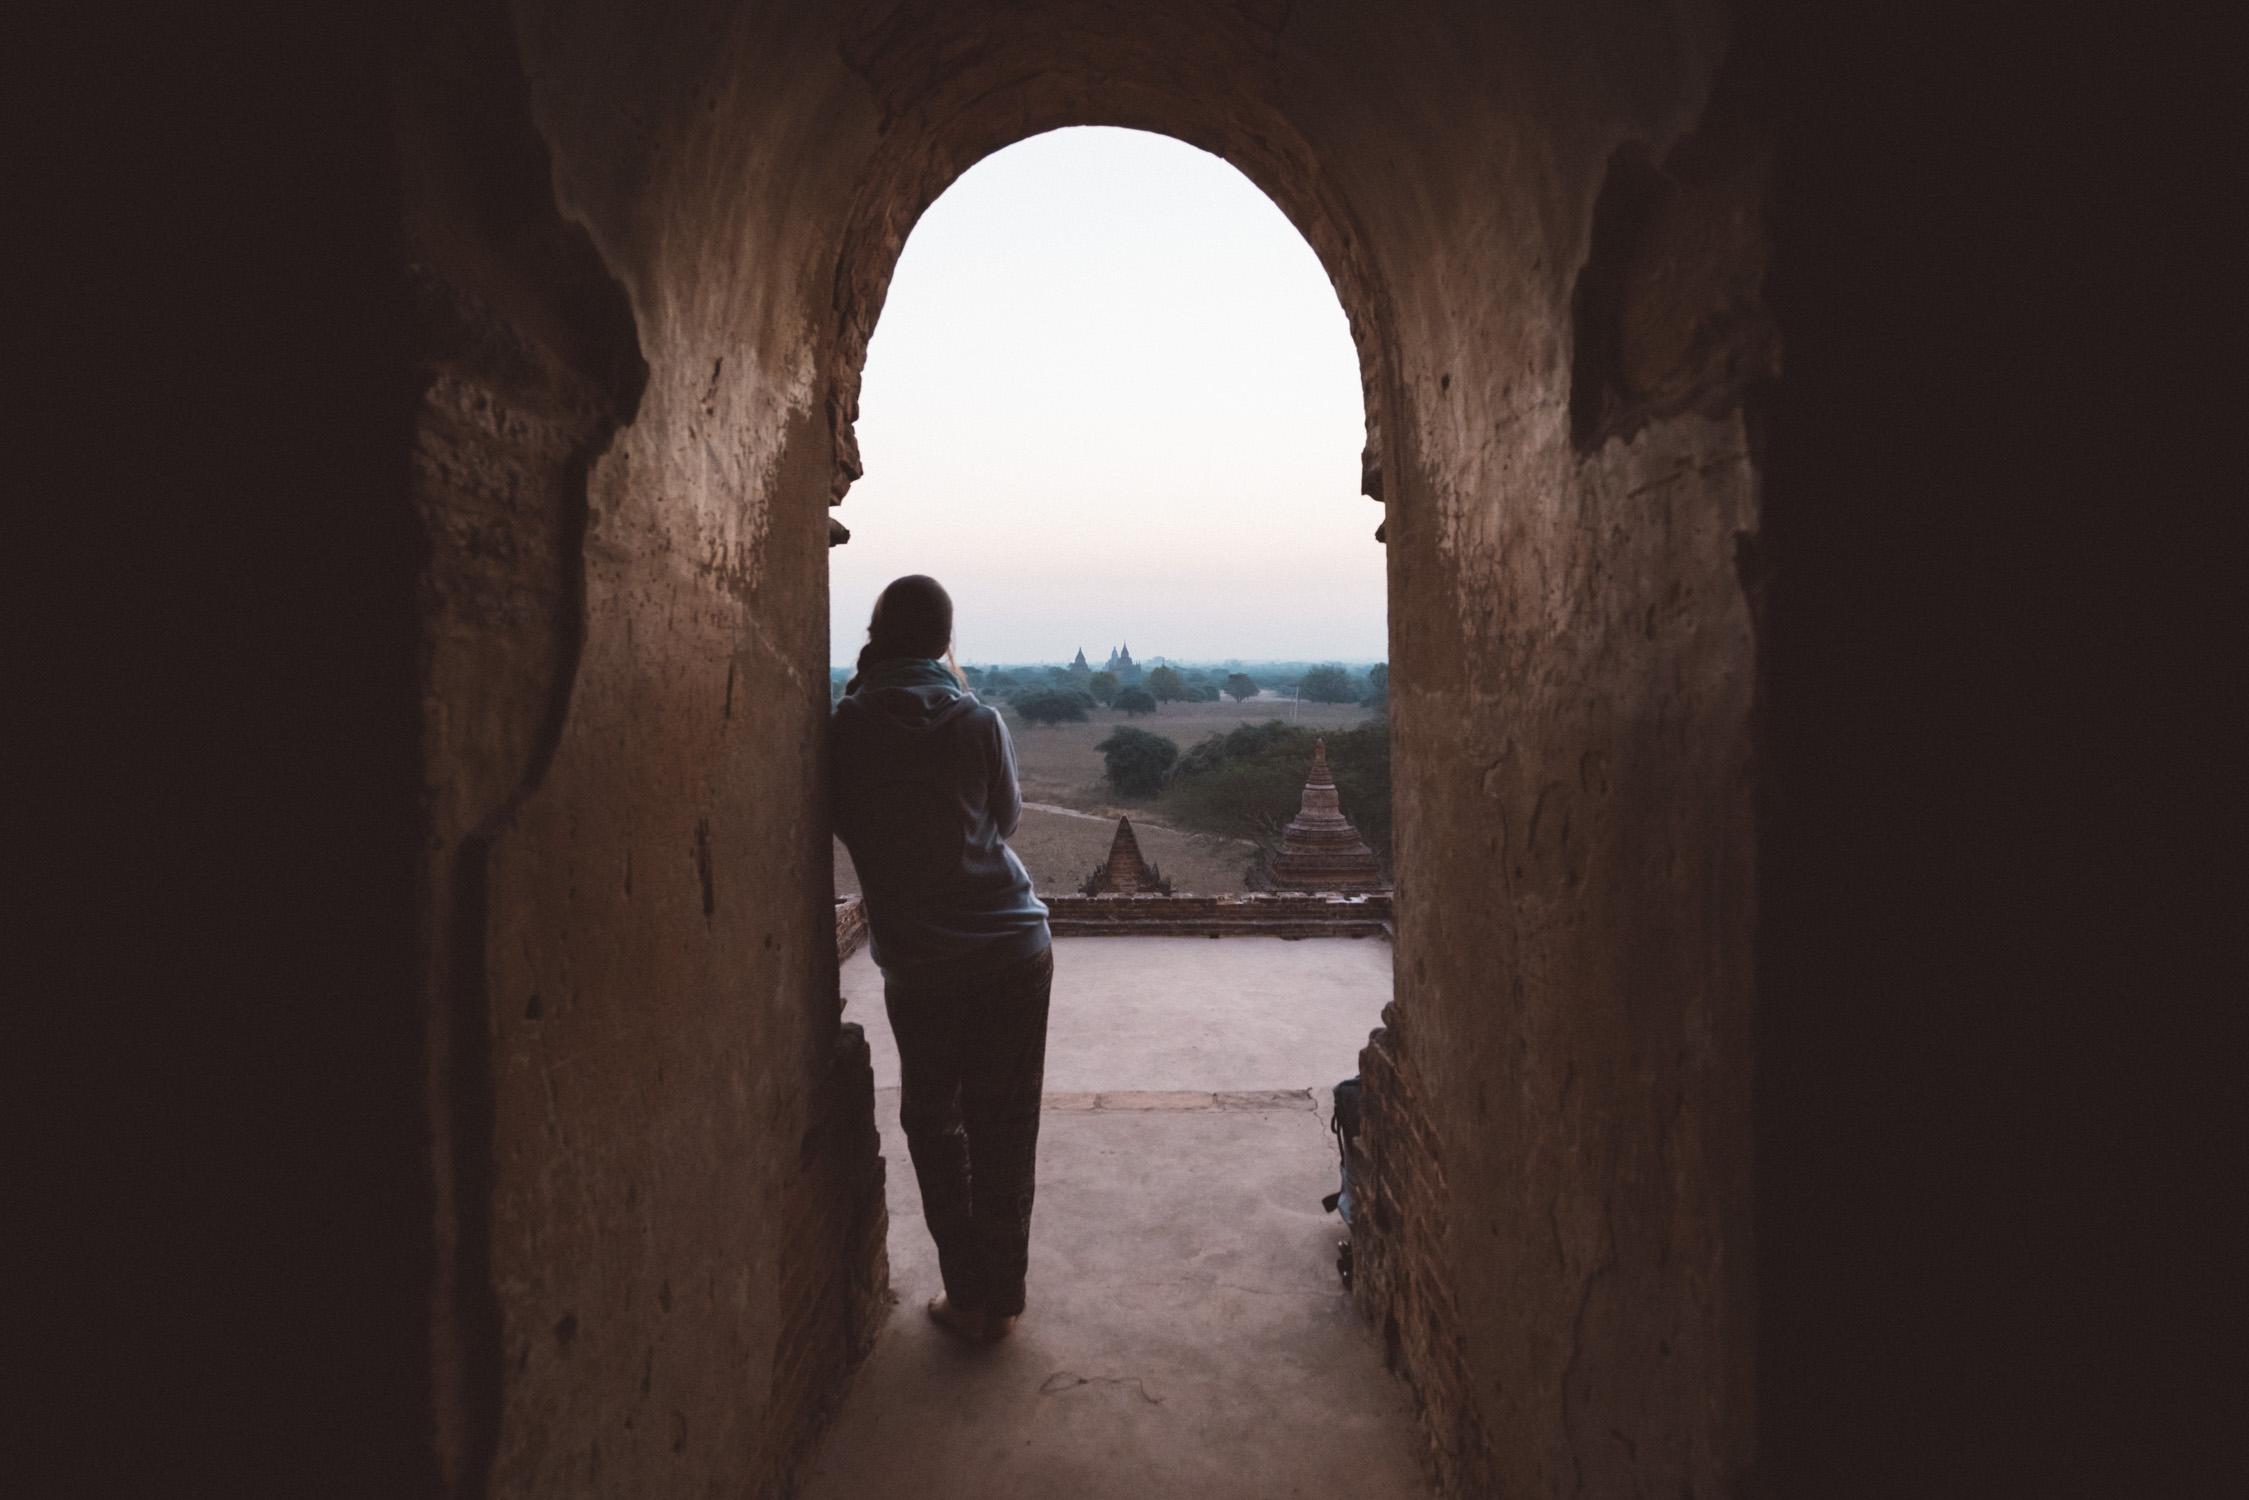 sunrise in Bagan temple portrait [David Tan]